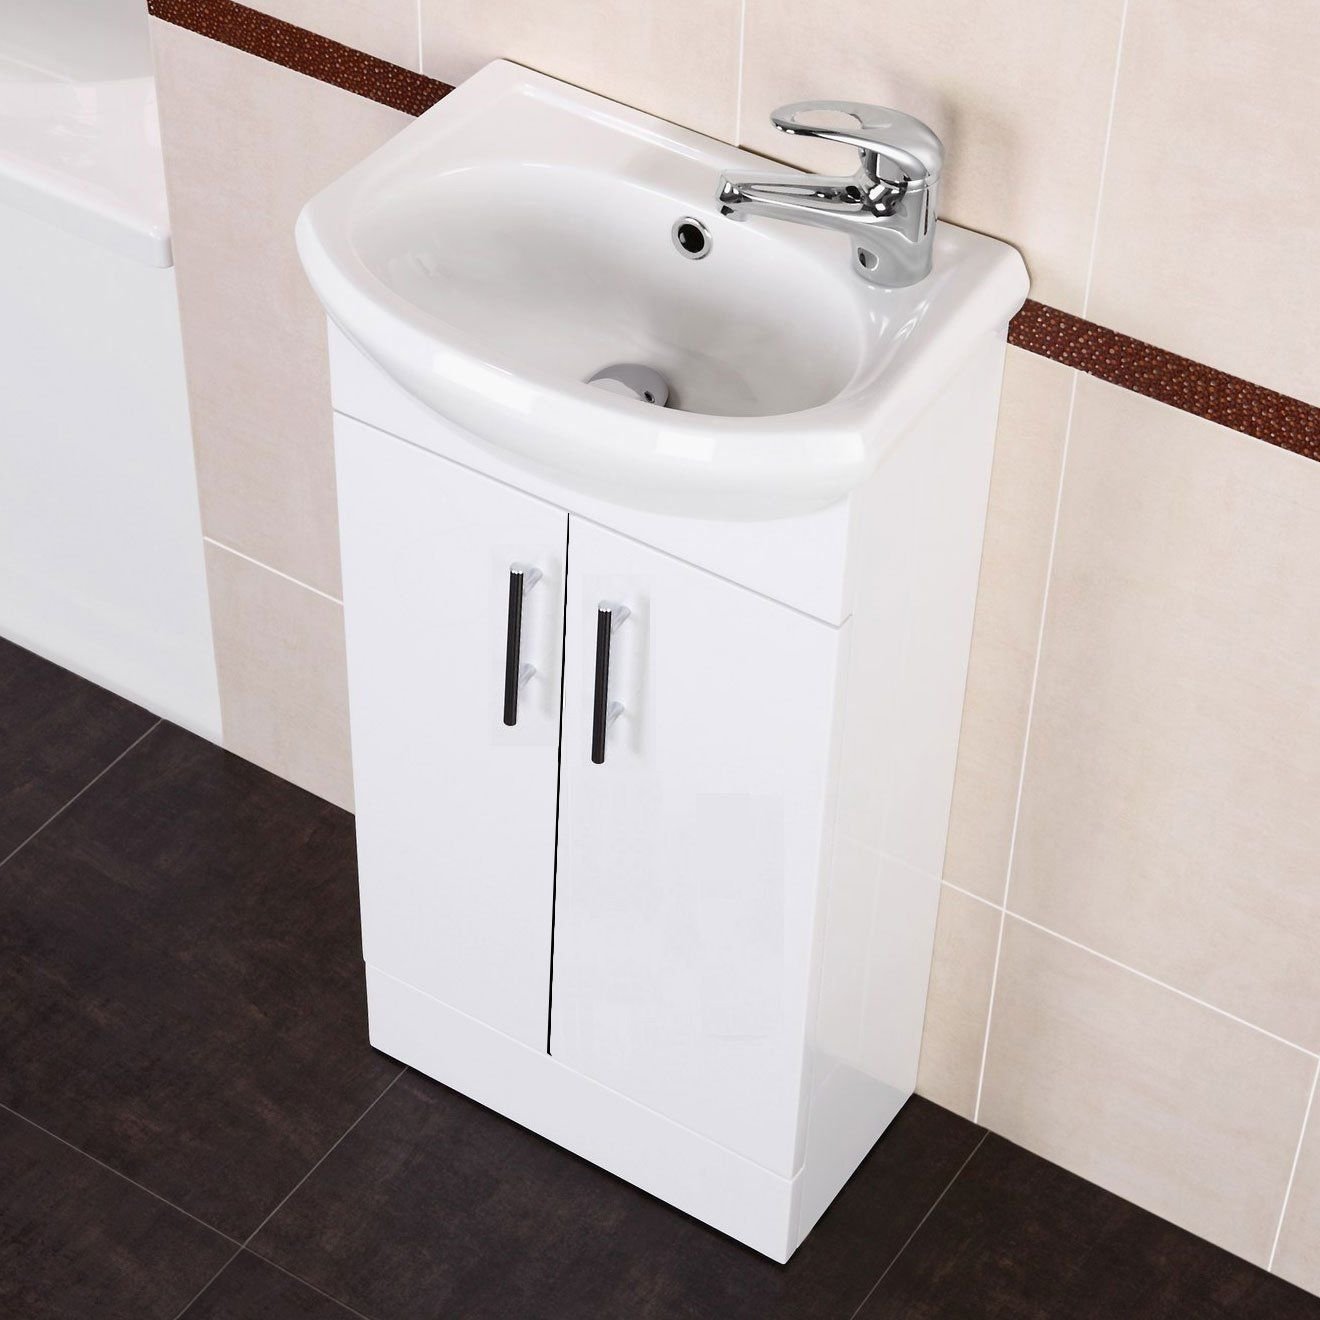 small vanity sink unit. White Small Compact Basin Vanity Unit Bathroom Cloakroom Furniture Ceramic  400 Amazon Co Uk Kitchen Home Pinterest